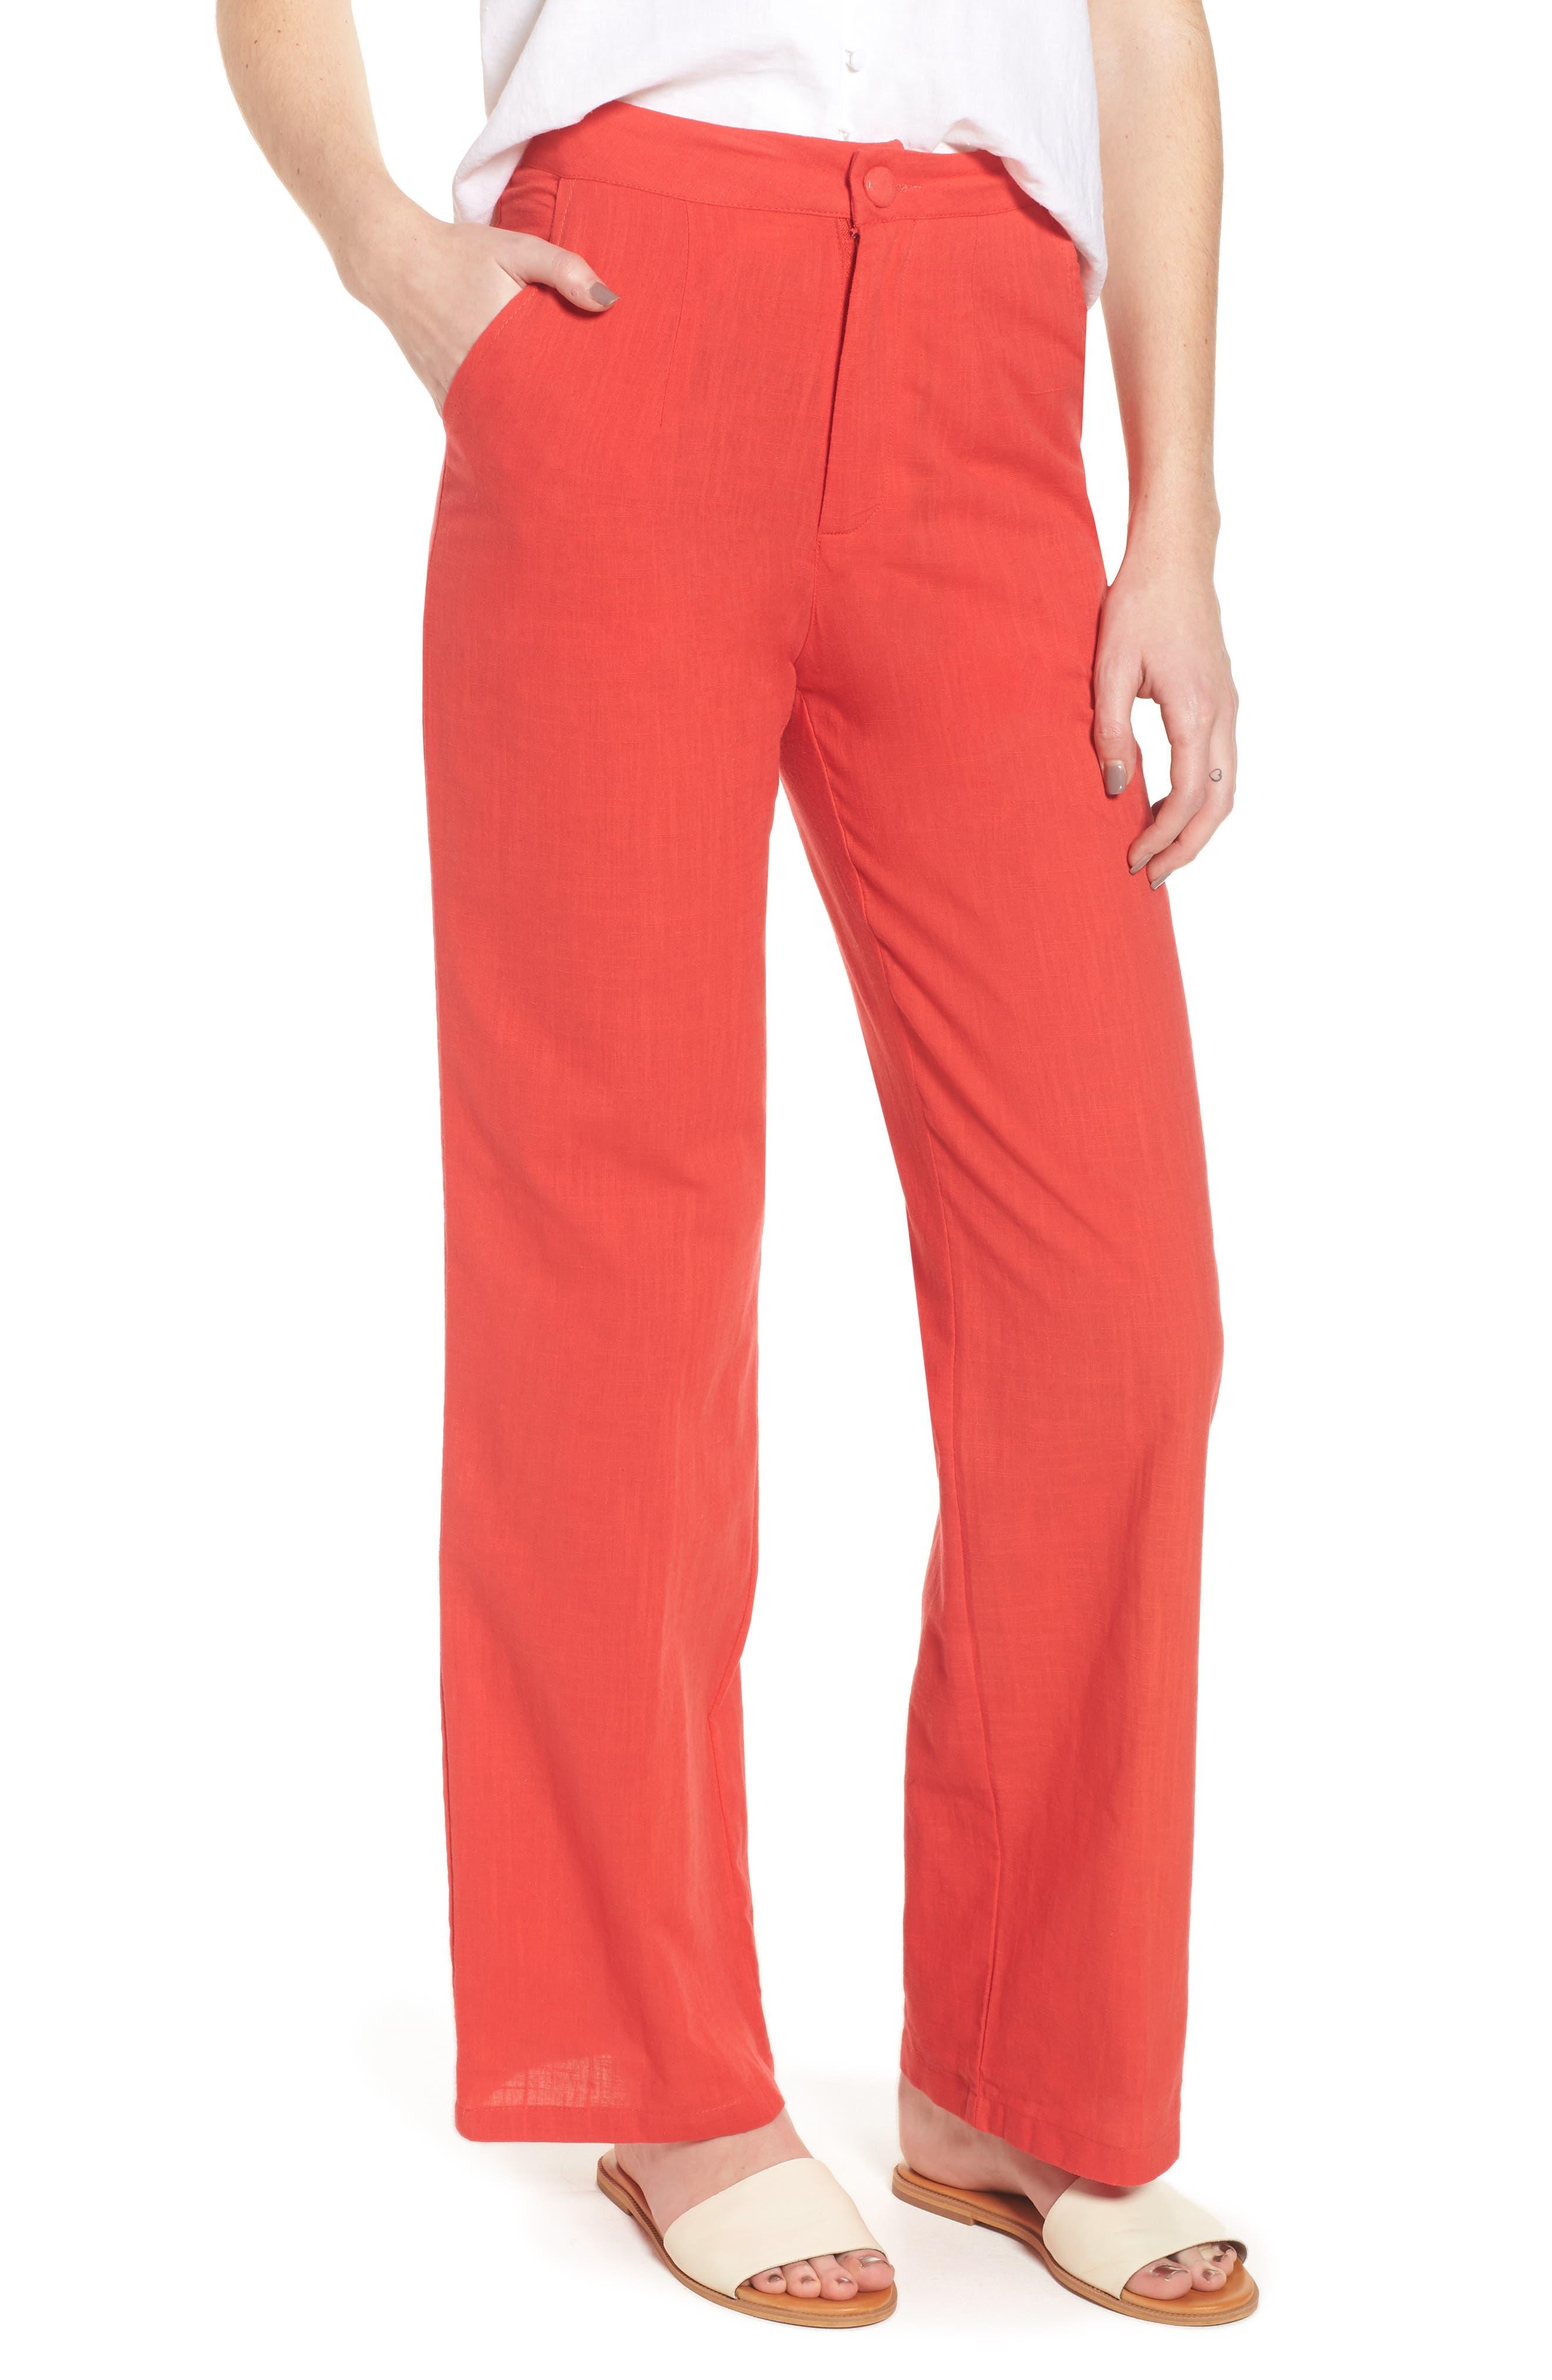 Femme Fatale High Waist Pants,                             Main thumbnail 1, color,                             Red